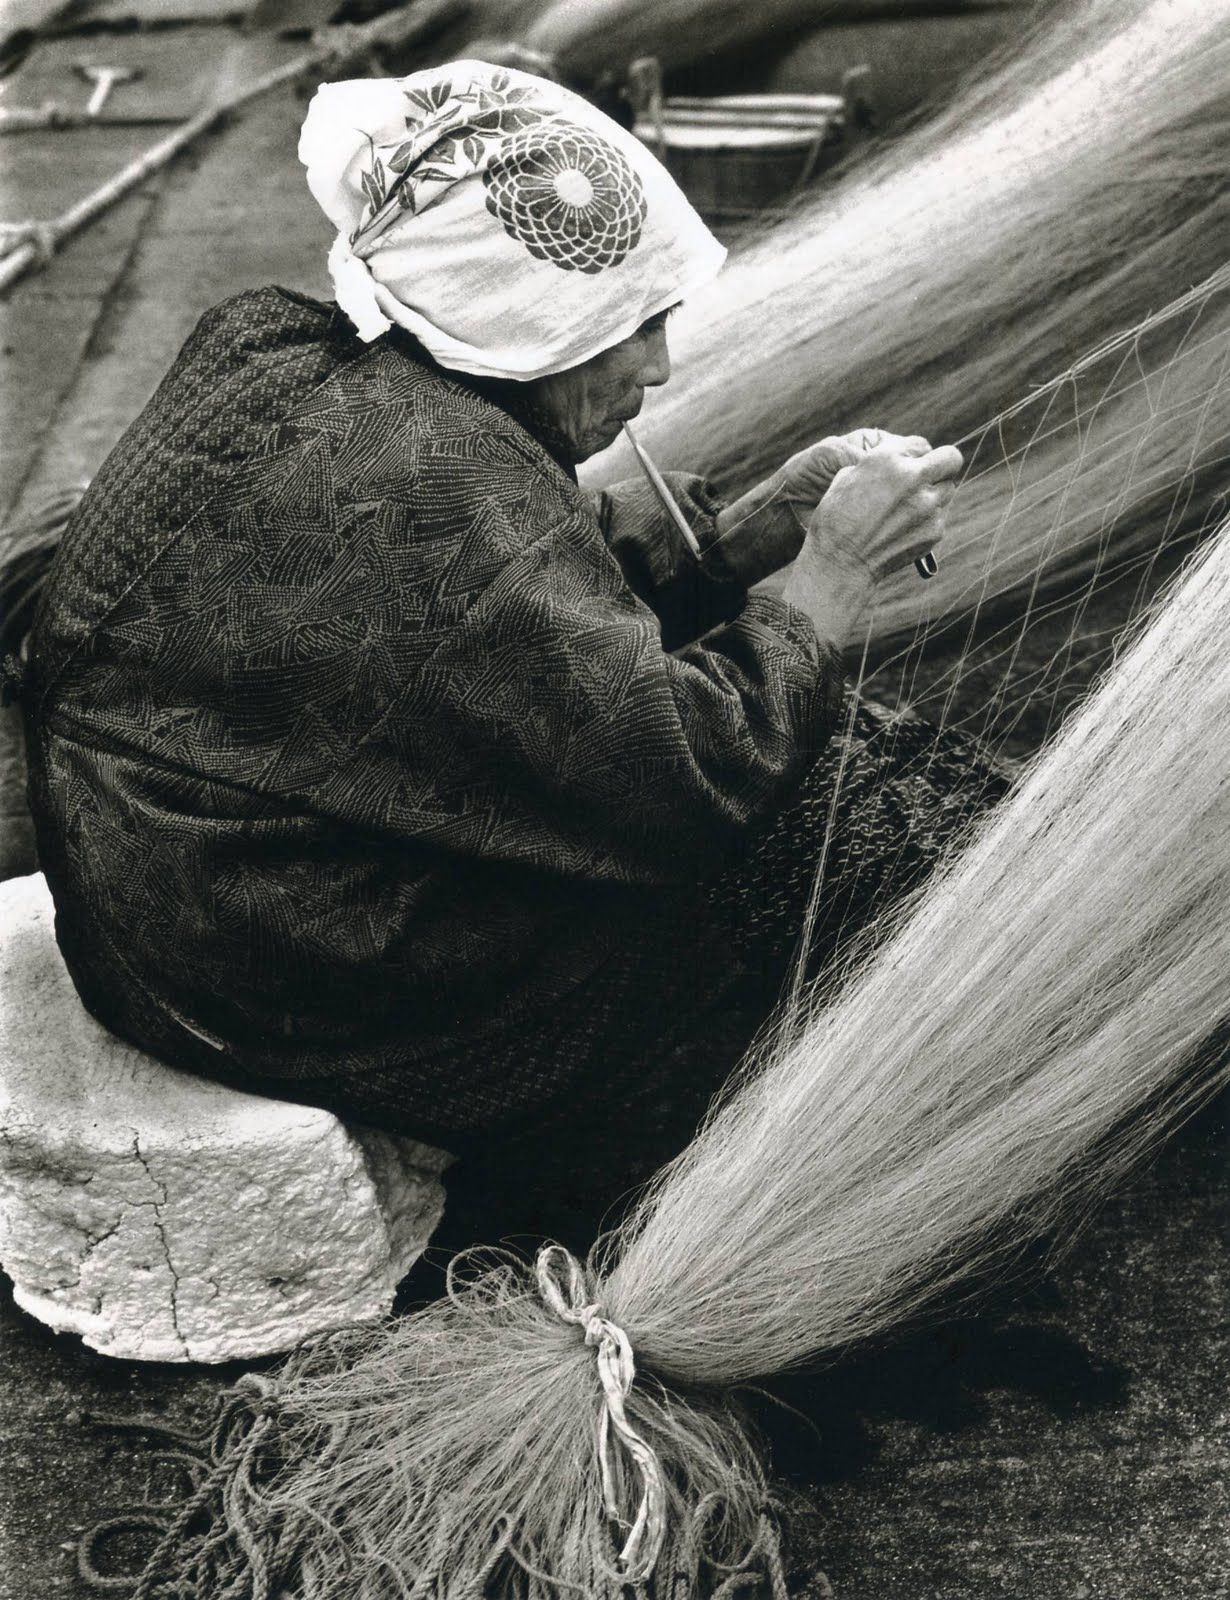 Mending fish net: photo by Linda Butler from Rural Japan